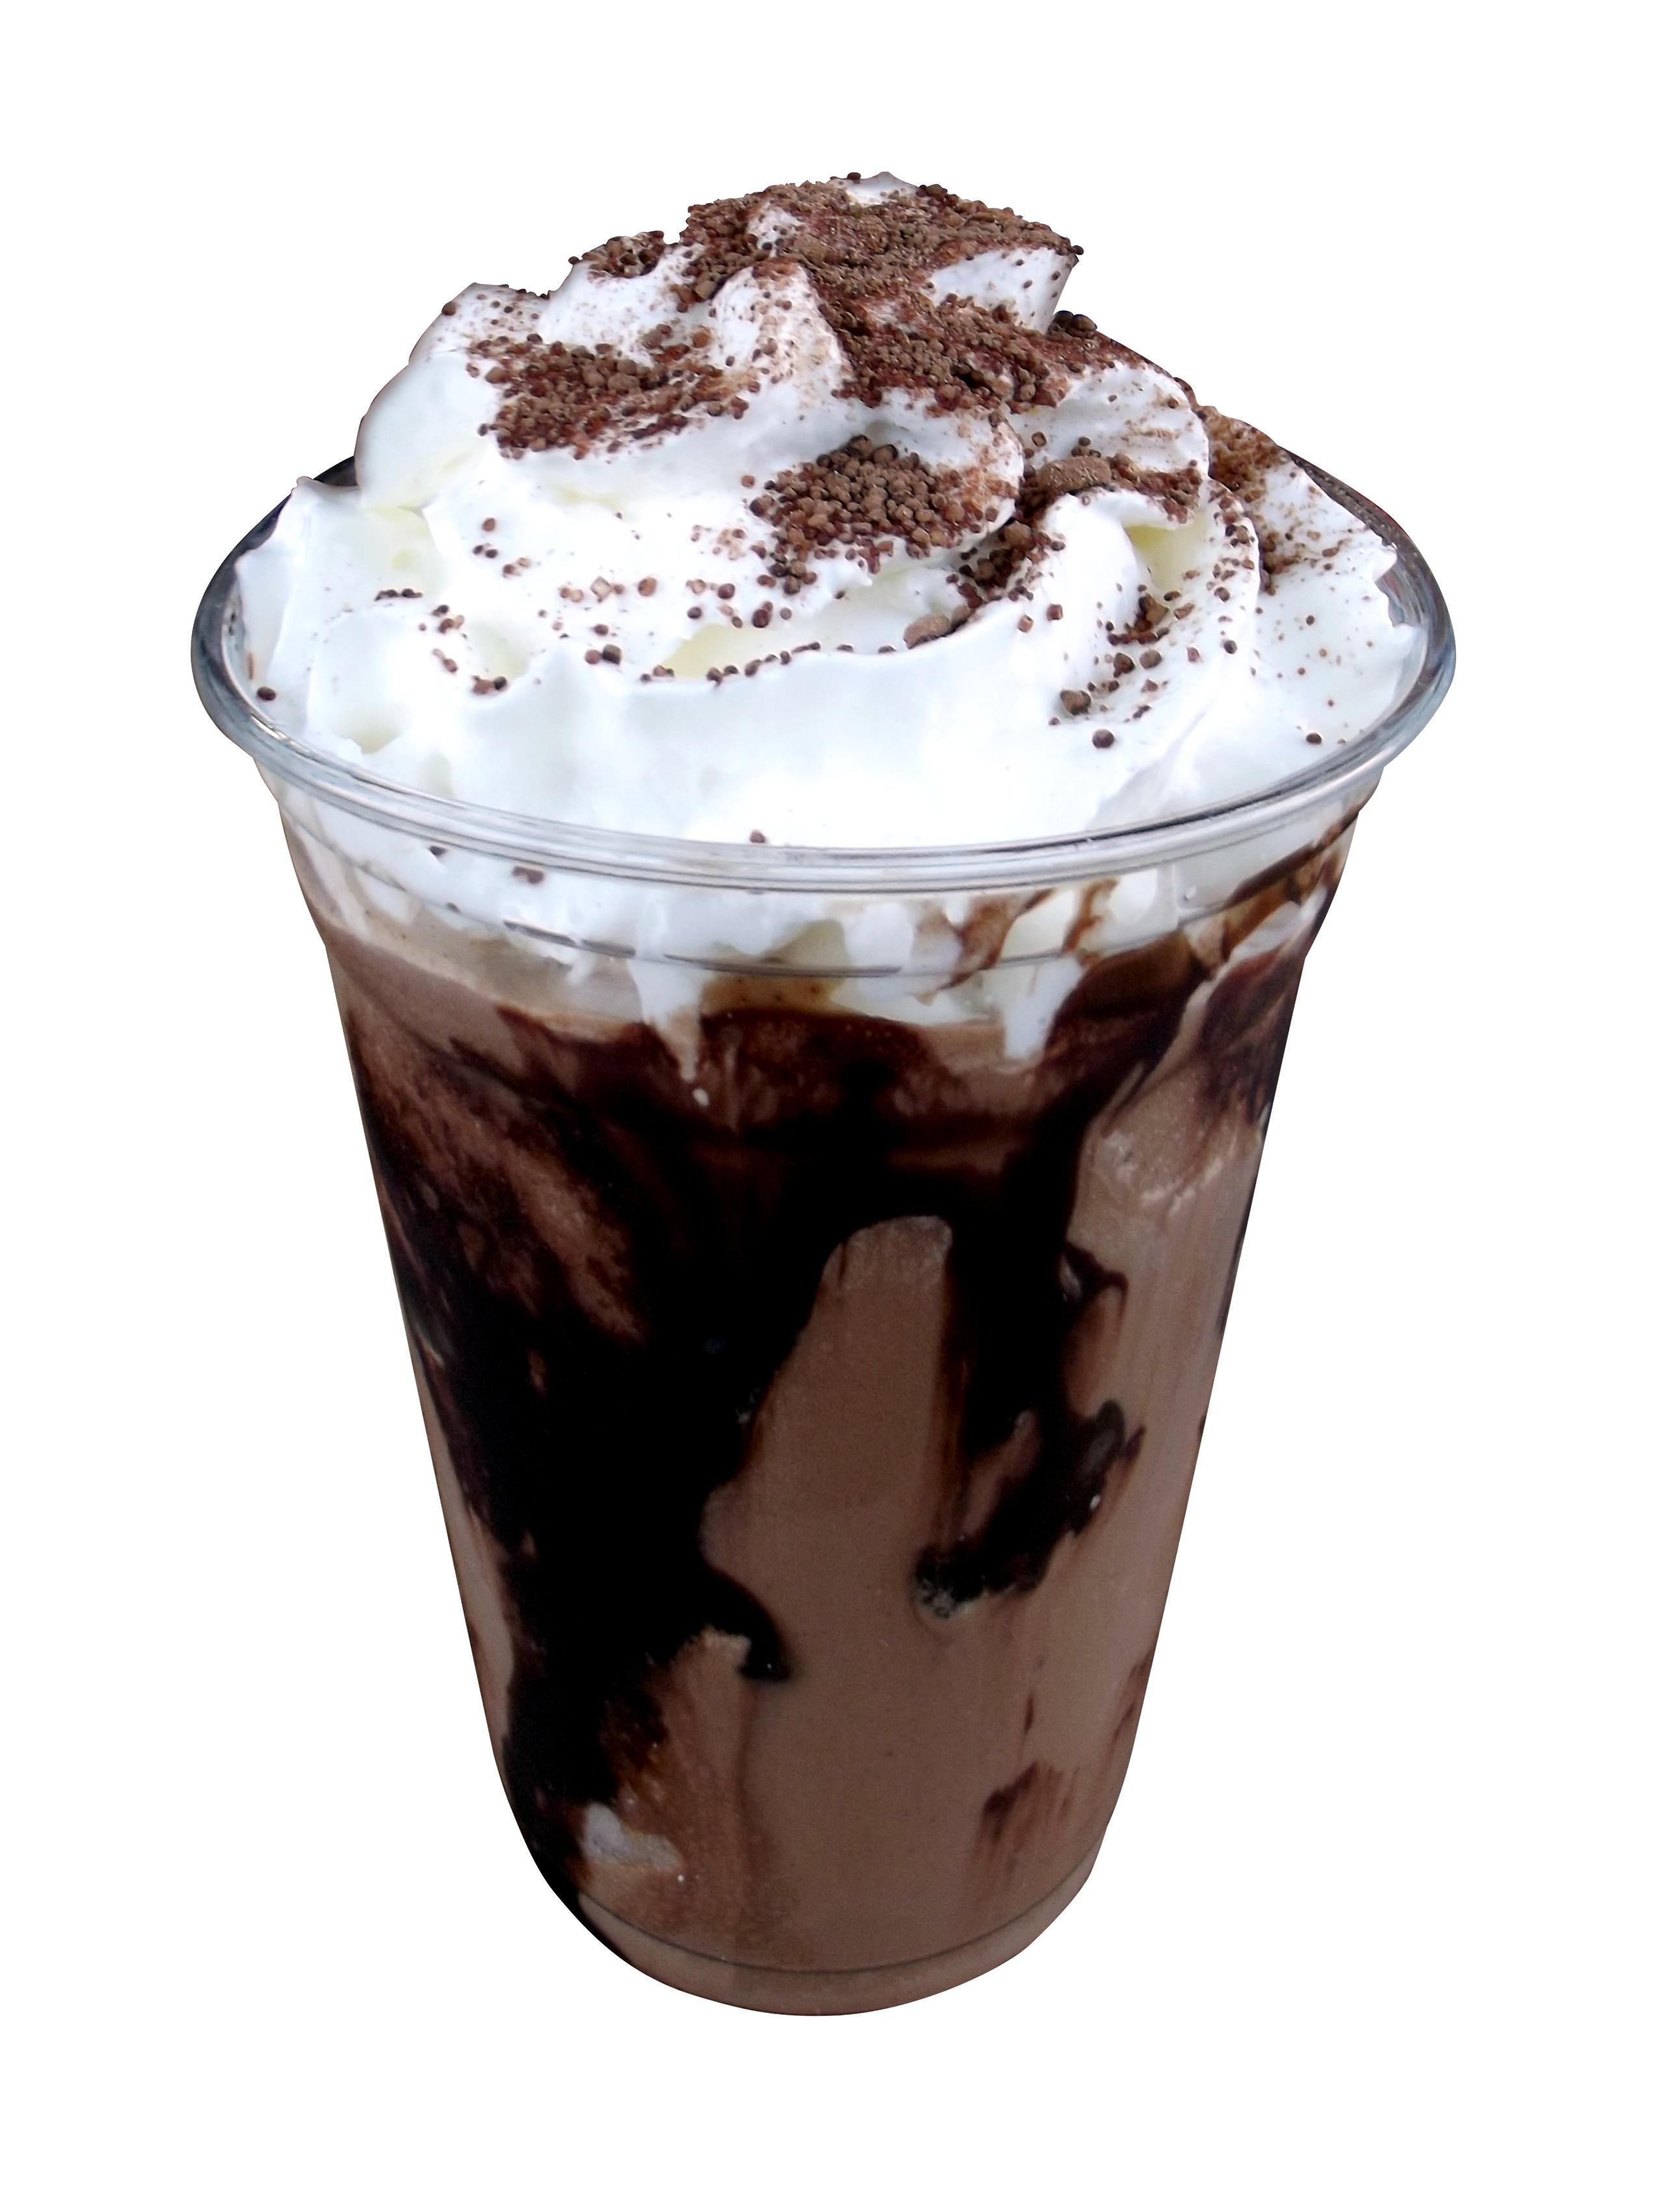 fotos gratis fr237o dulce vaso latt233 chocolate